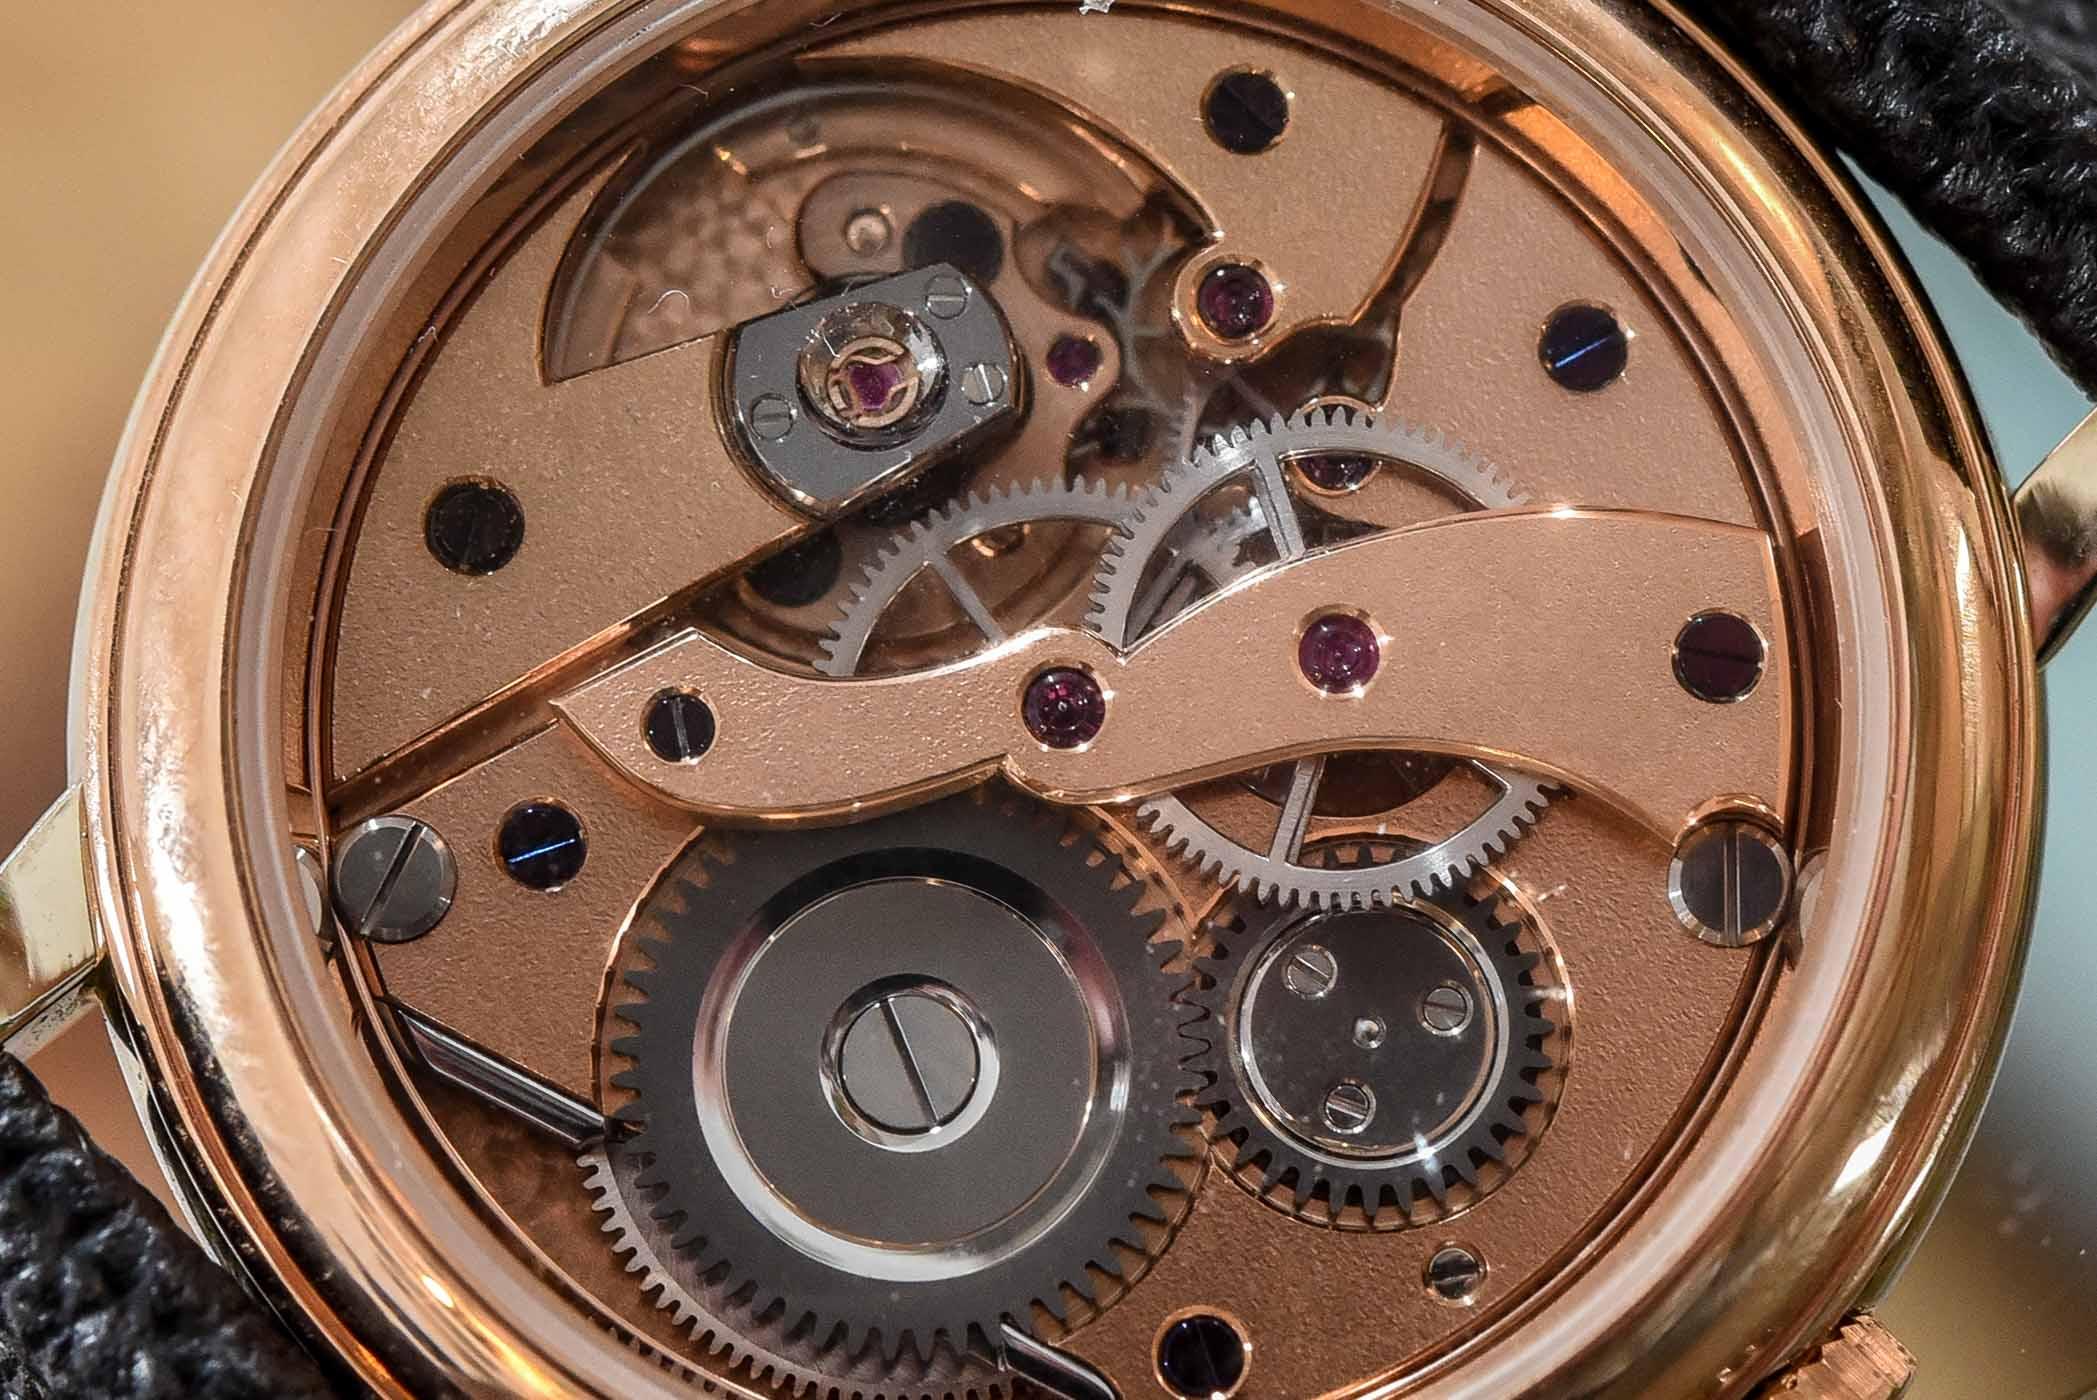 Atelier de Chronometrie